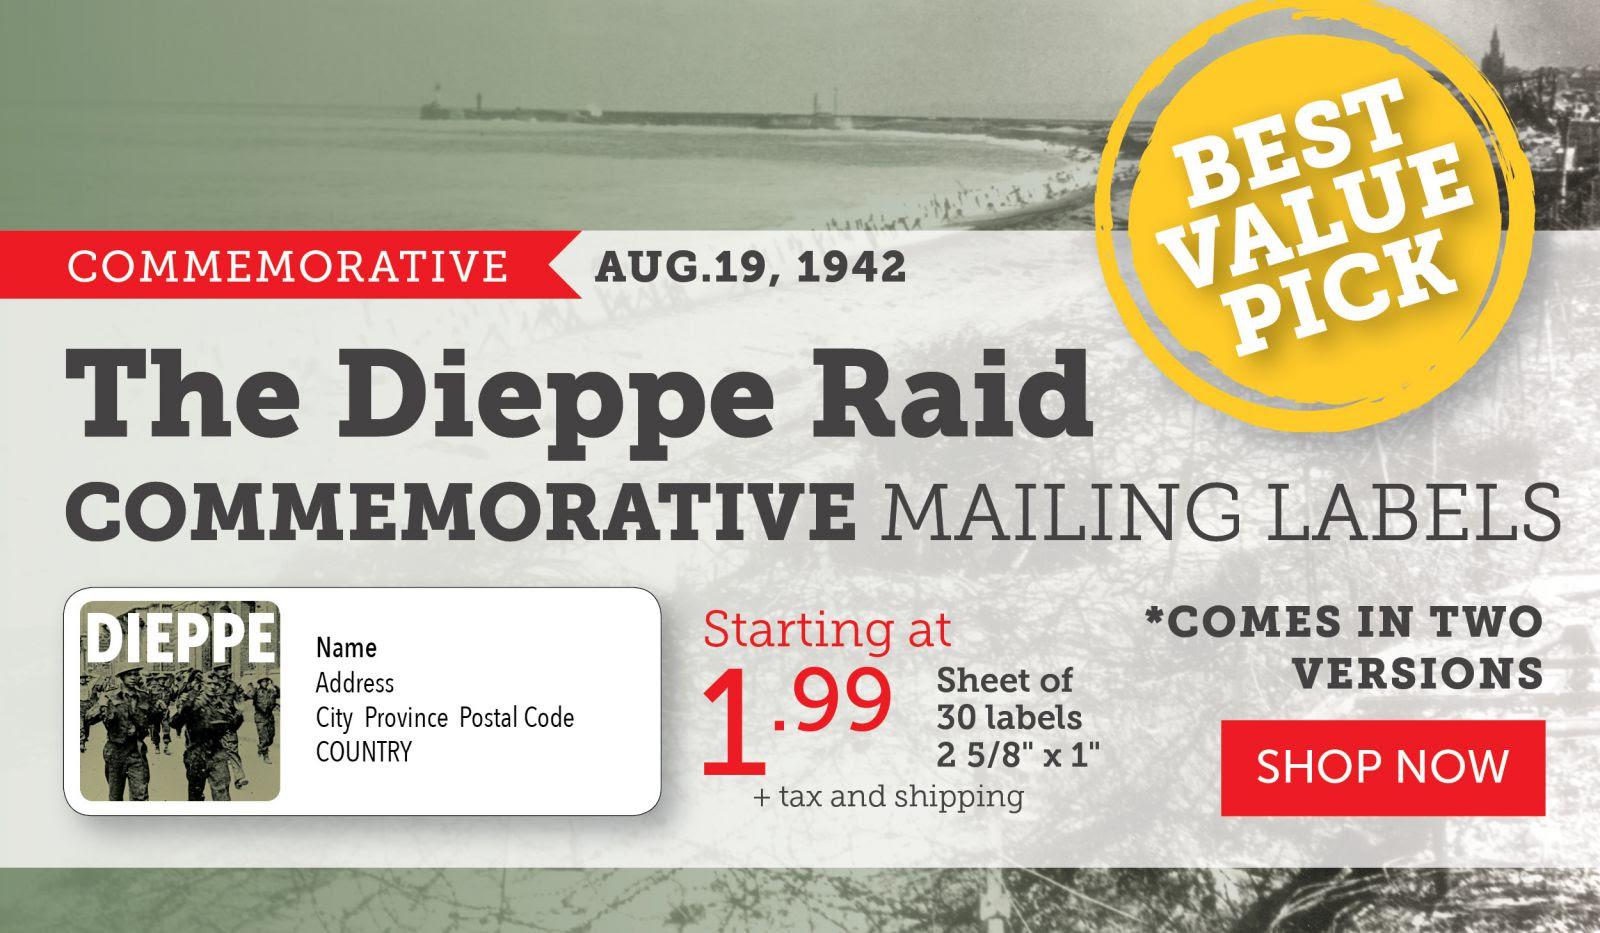 The Dieppe Raid Mailing Labels